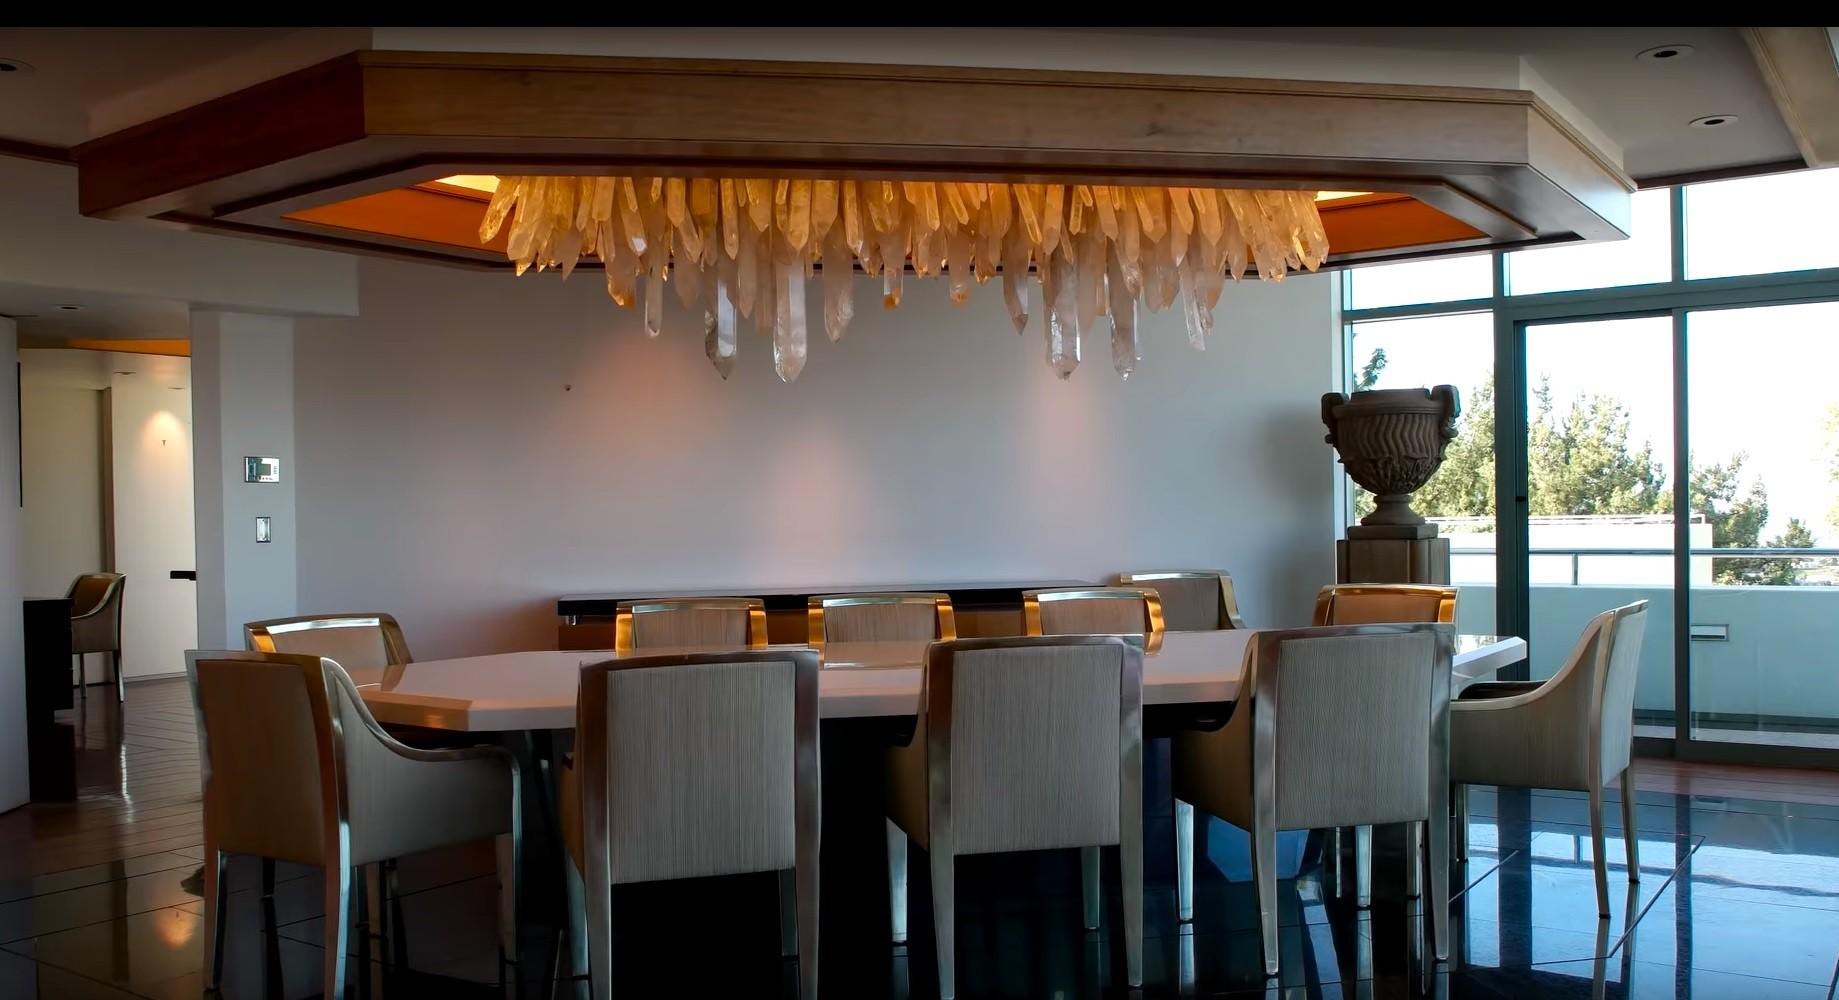 Pharrell Williams' dining room